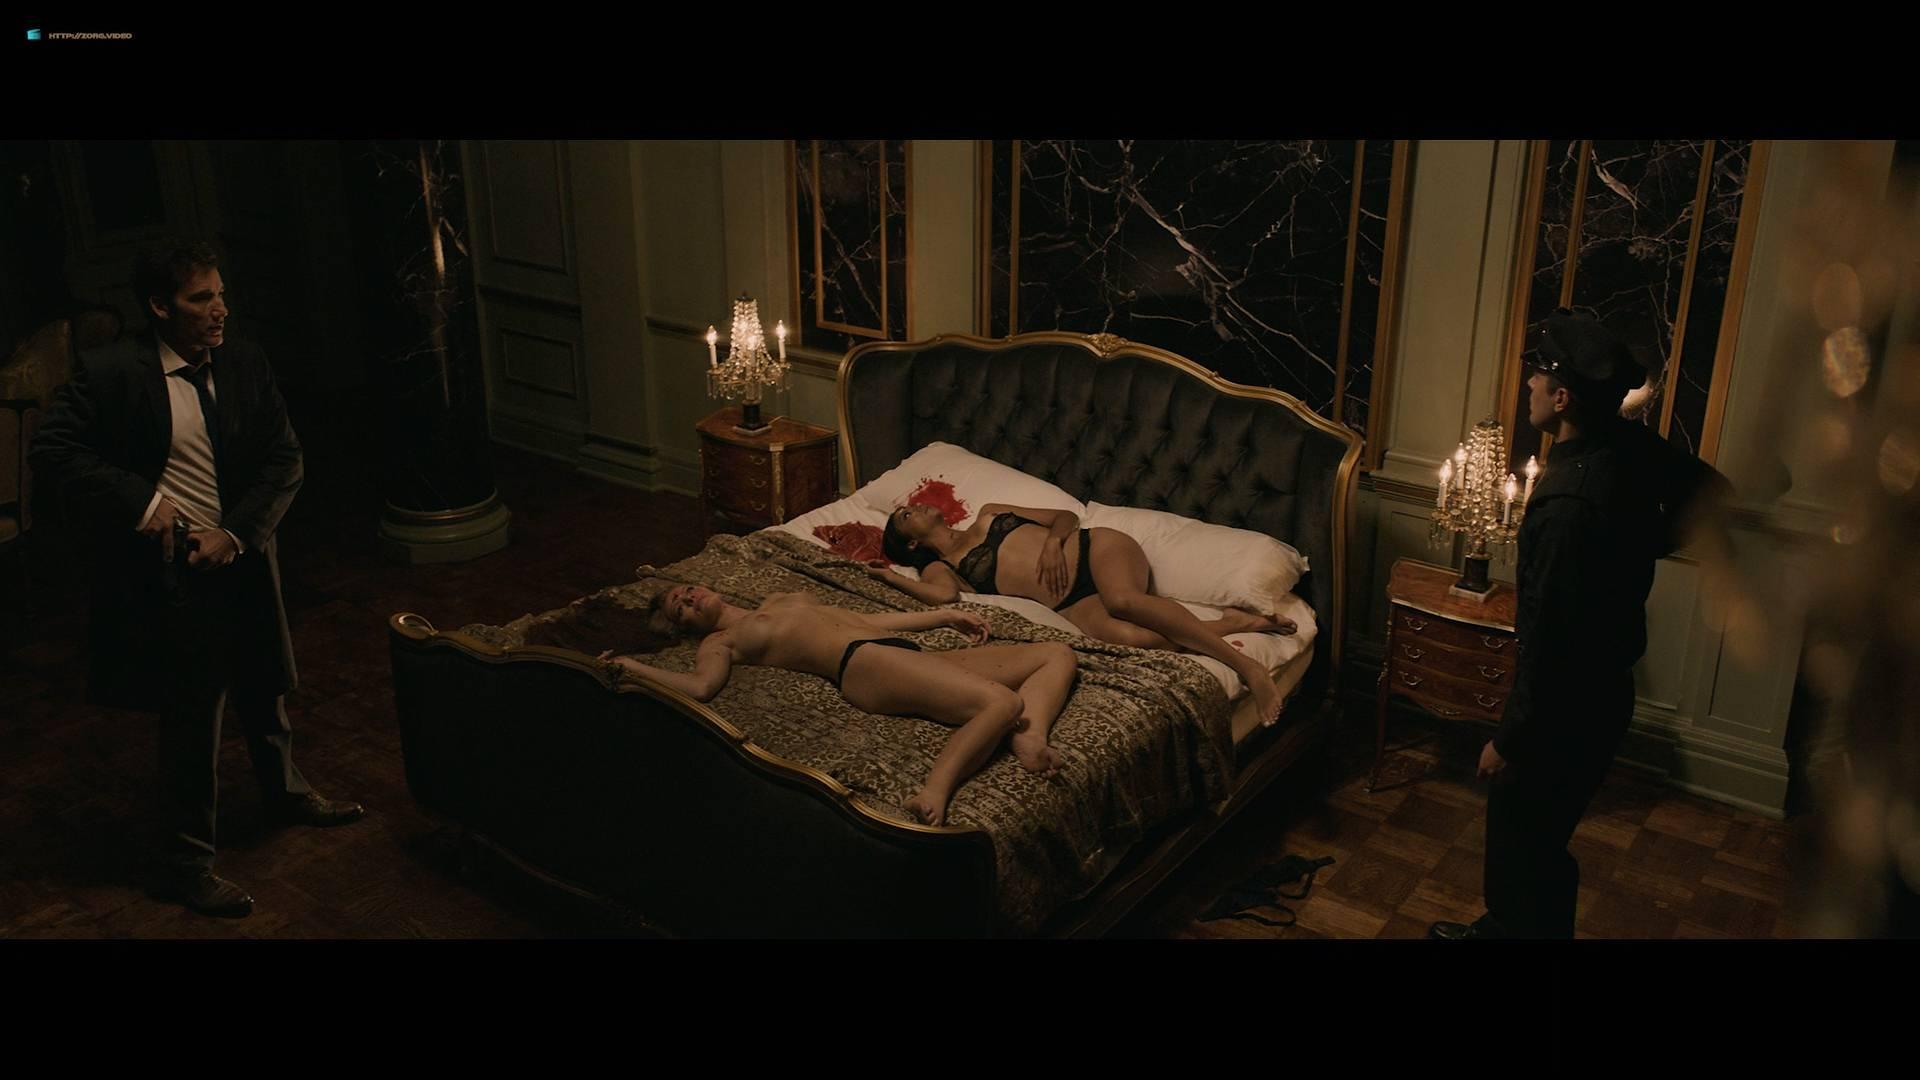 Amanda seyfried anon 2018 sex scene 2